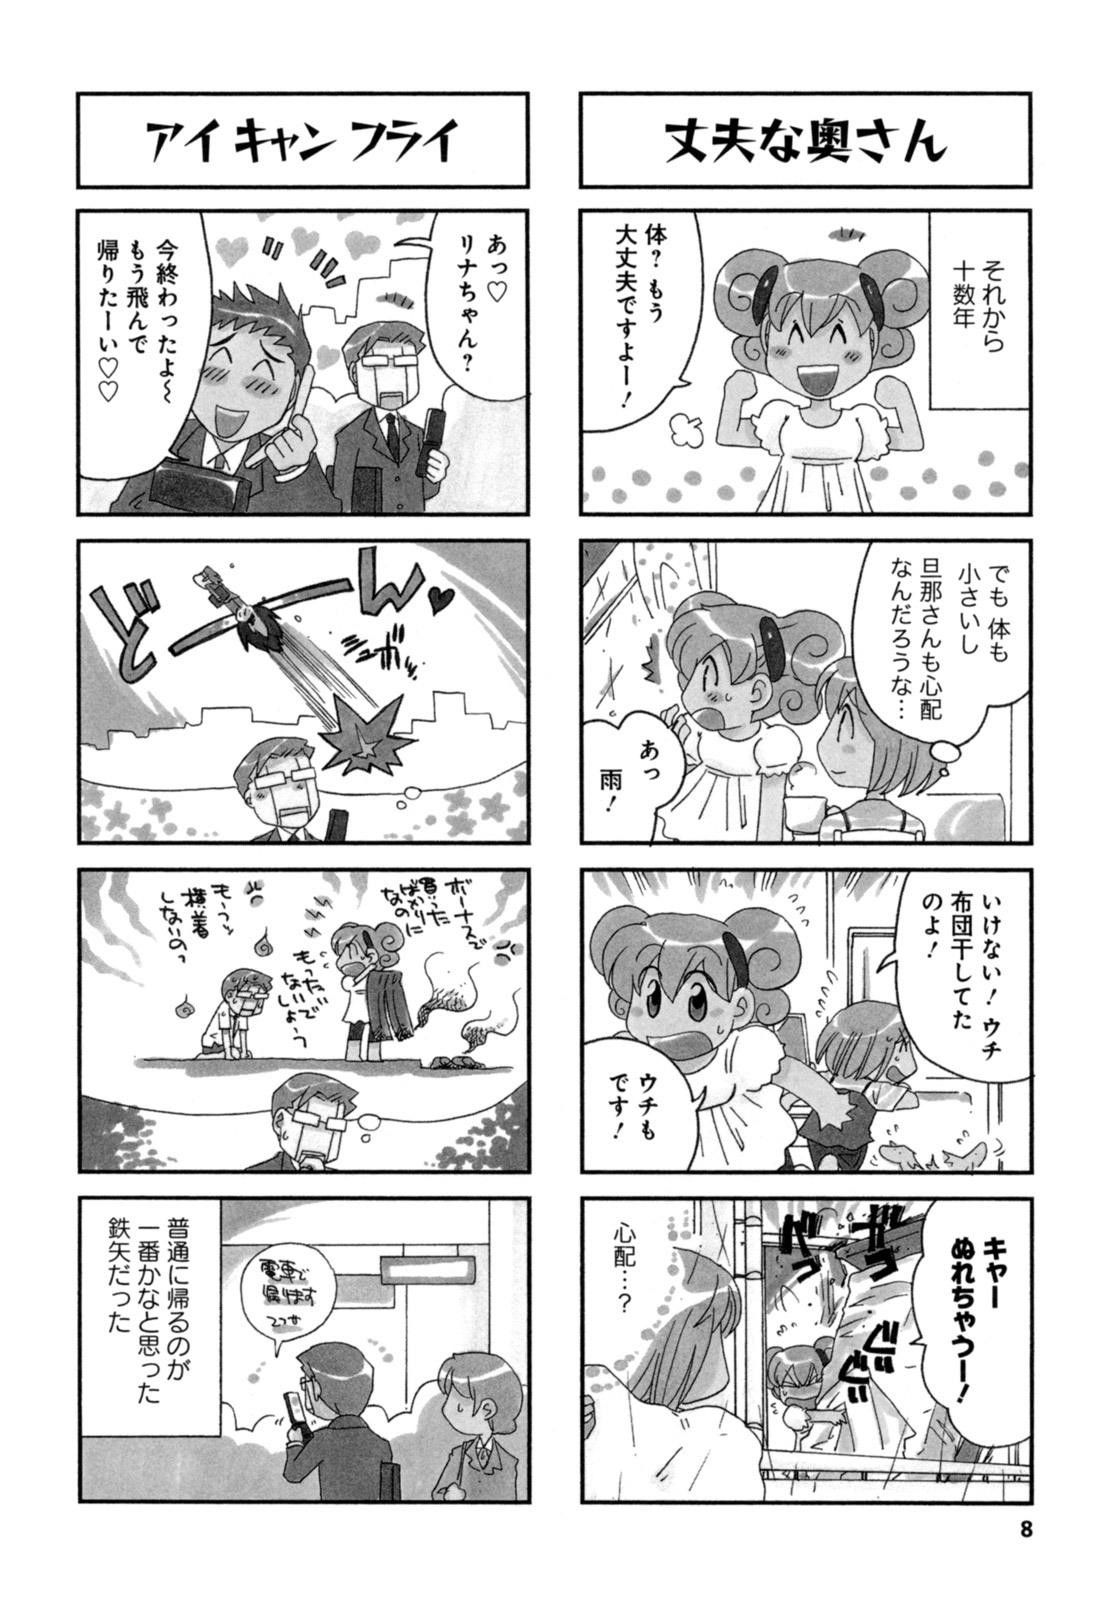 Images of 合金さんちの日常 - JapaneseClass.jp